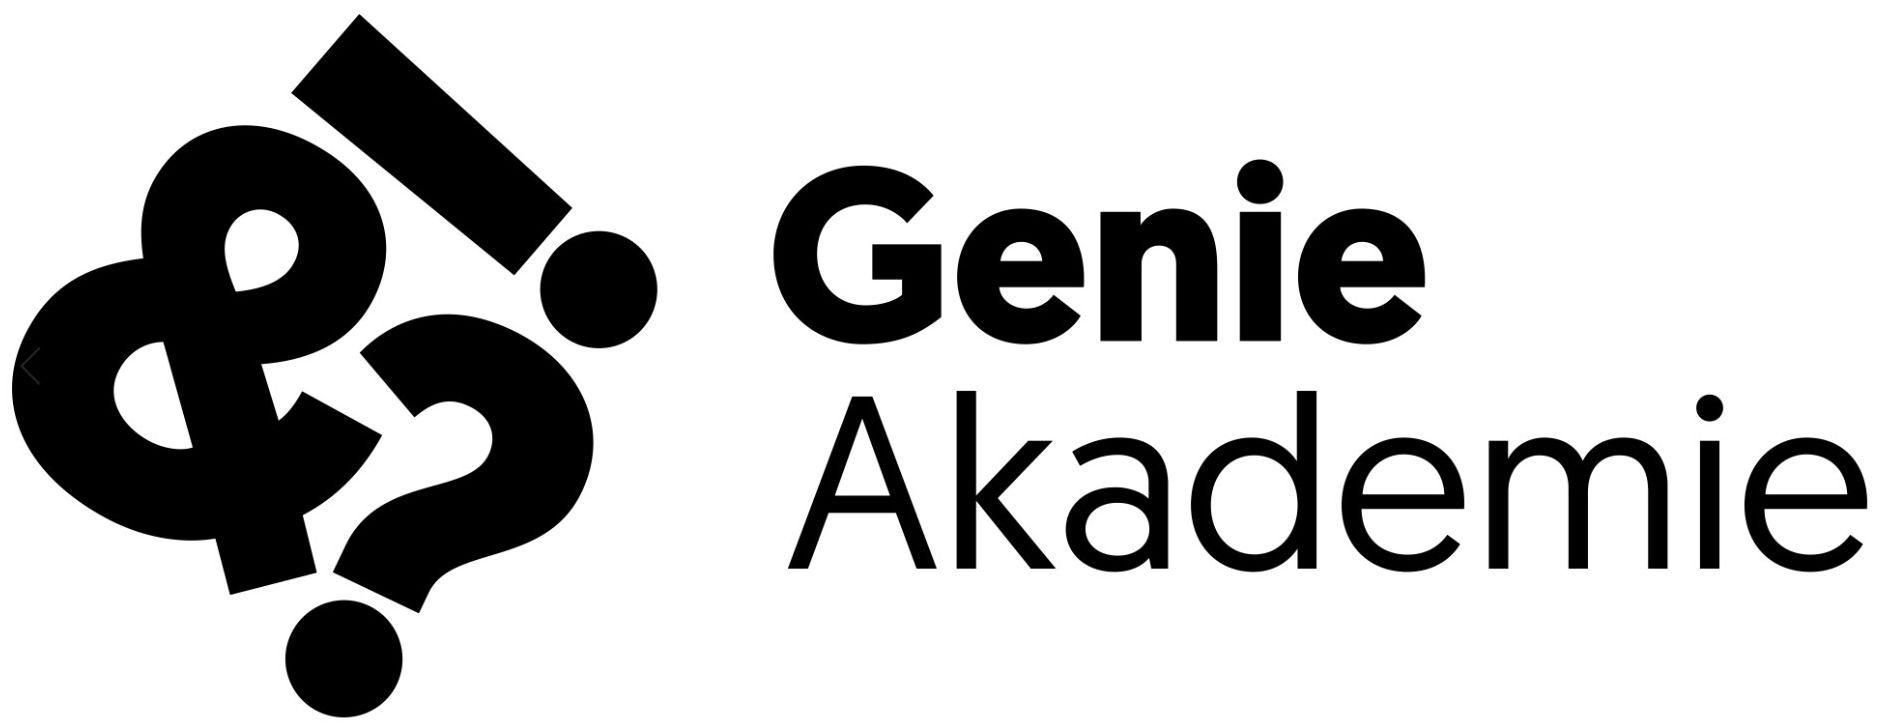 Wort-/Bildmarke: Genie Akademie